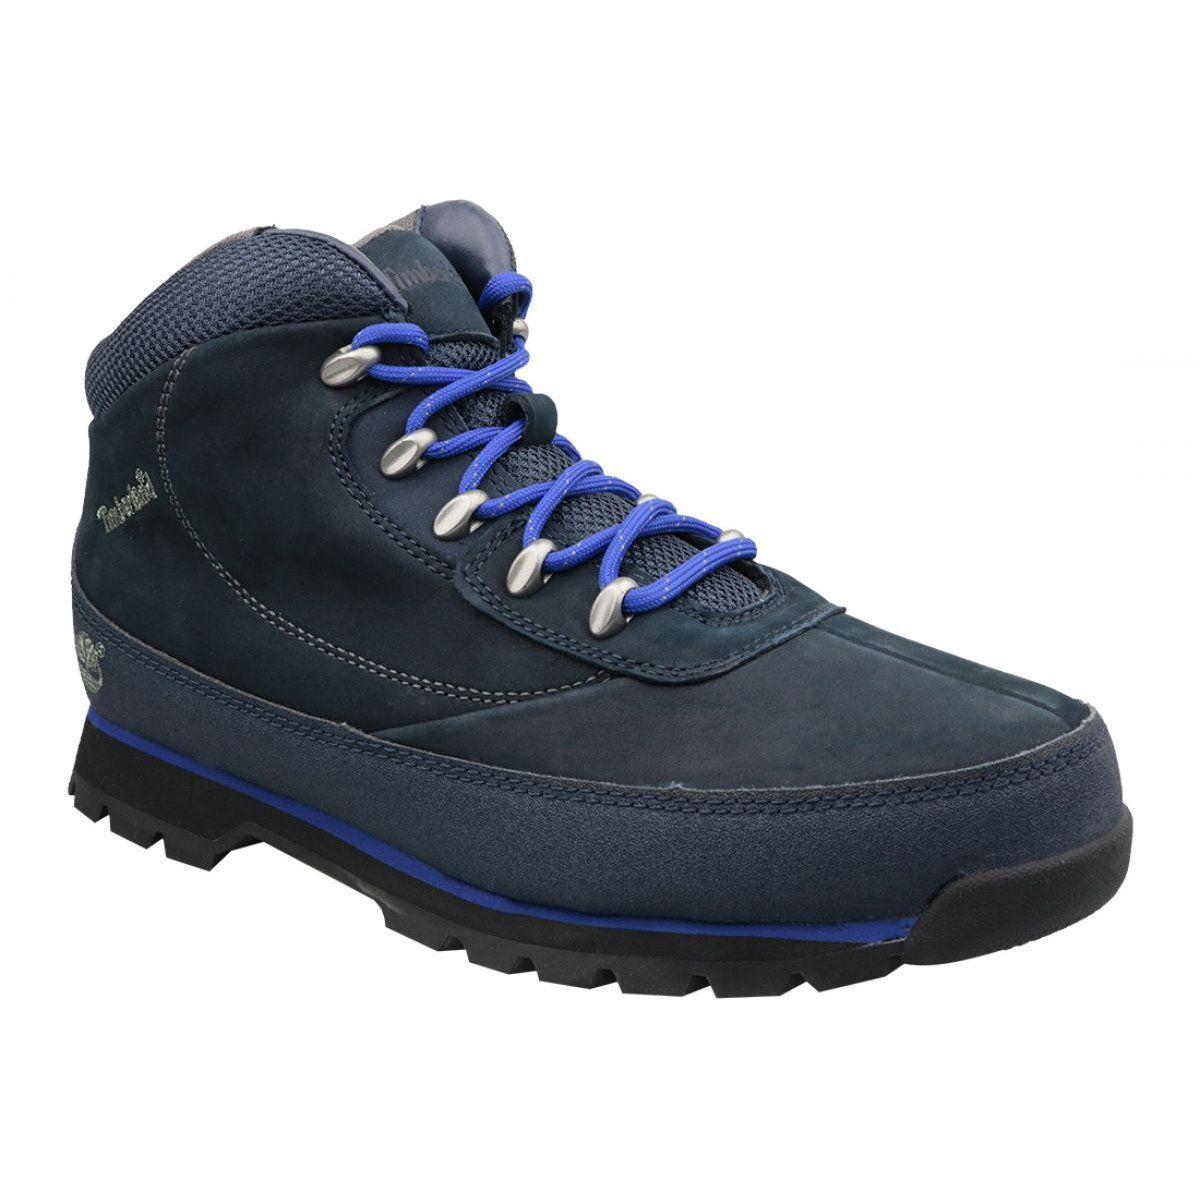 Buty Zimowe Timberland Euro Brook M 6707a Granatowe Winter Shoes Sport Shoes Men Nubuck Leather